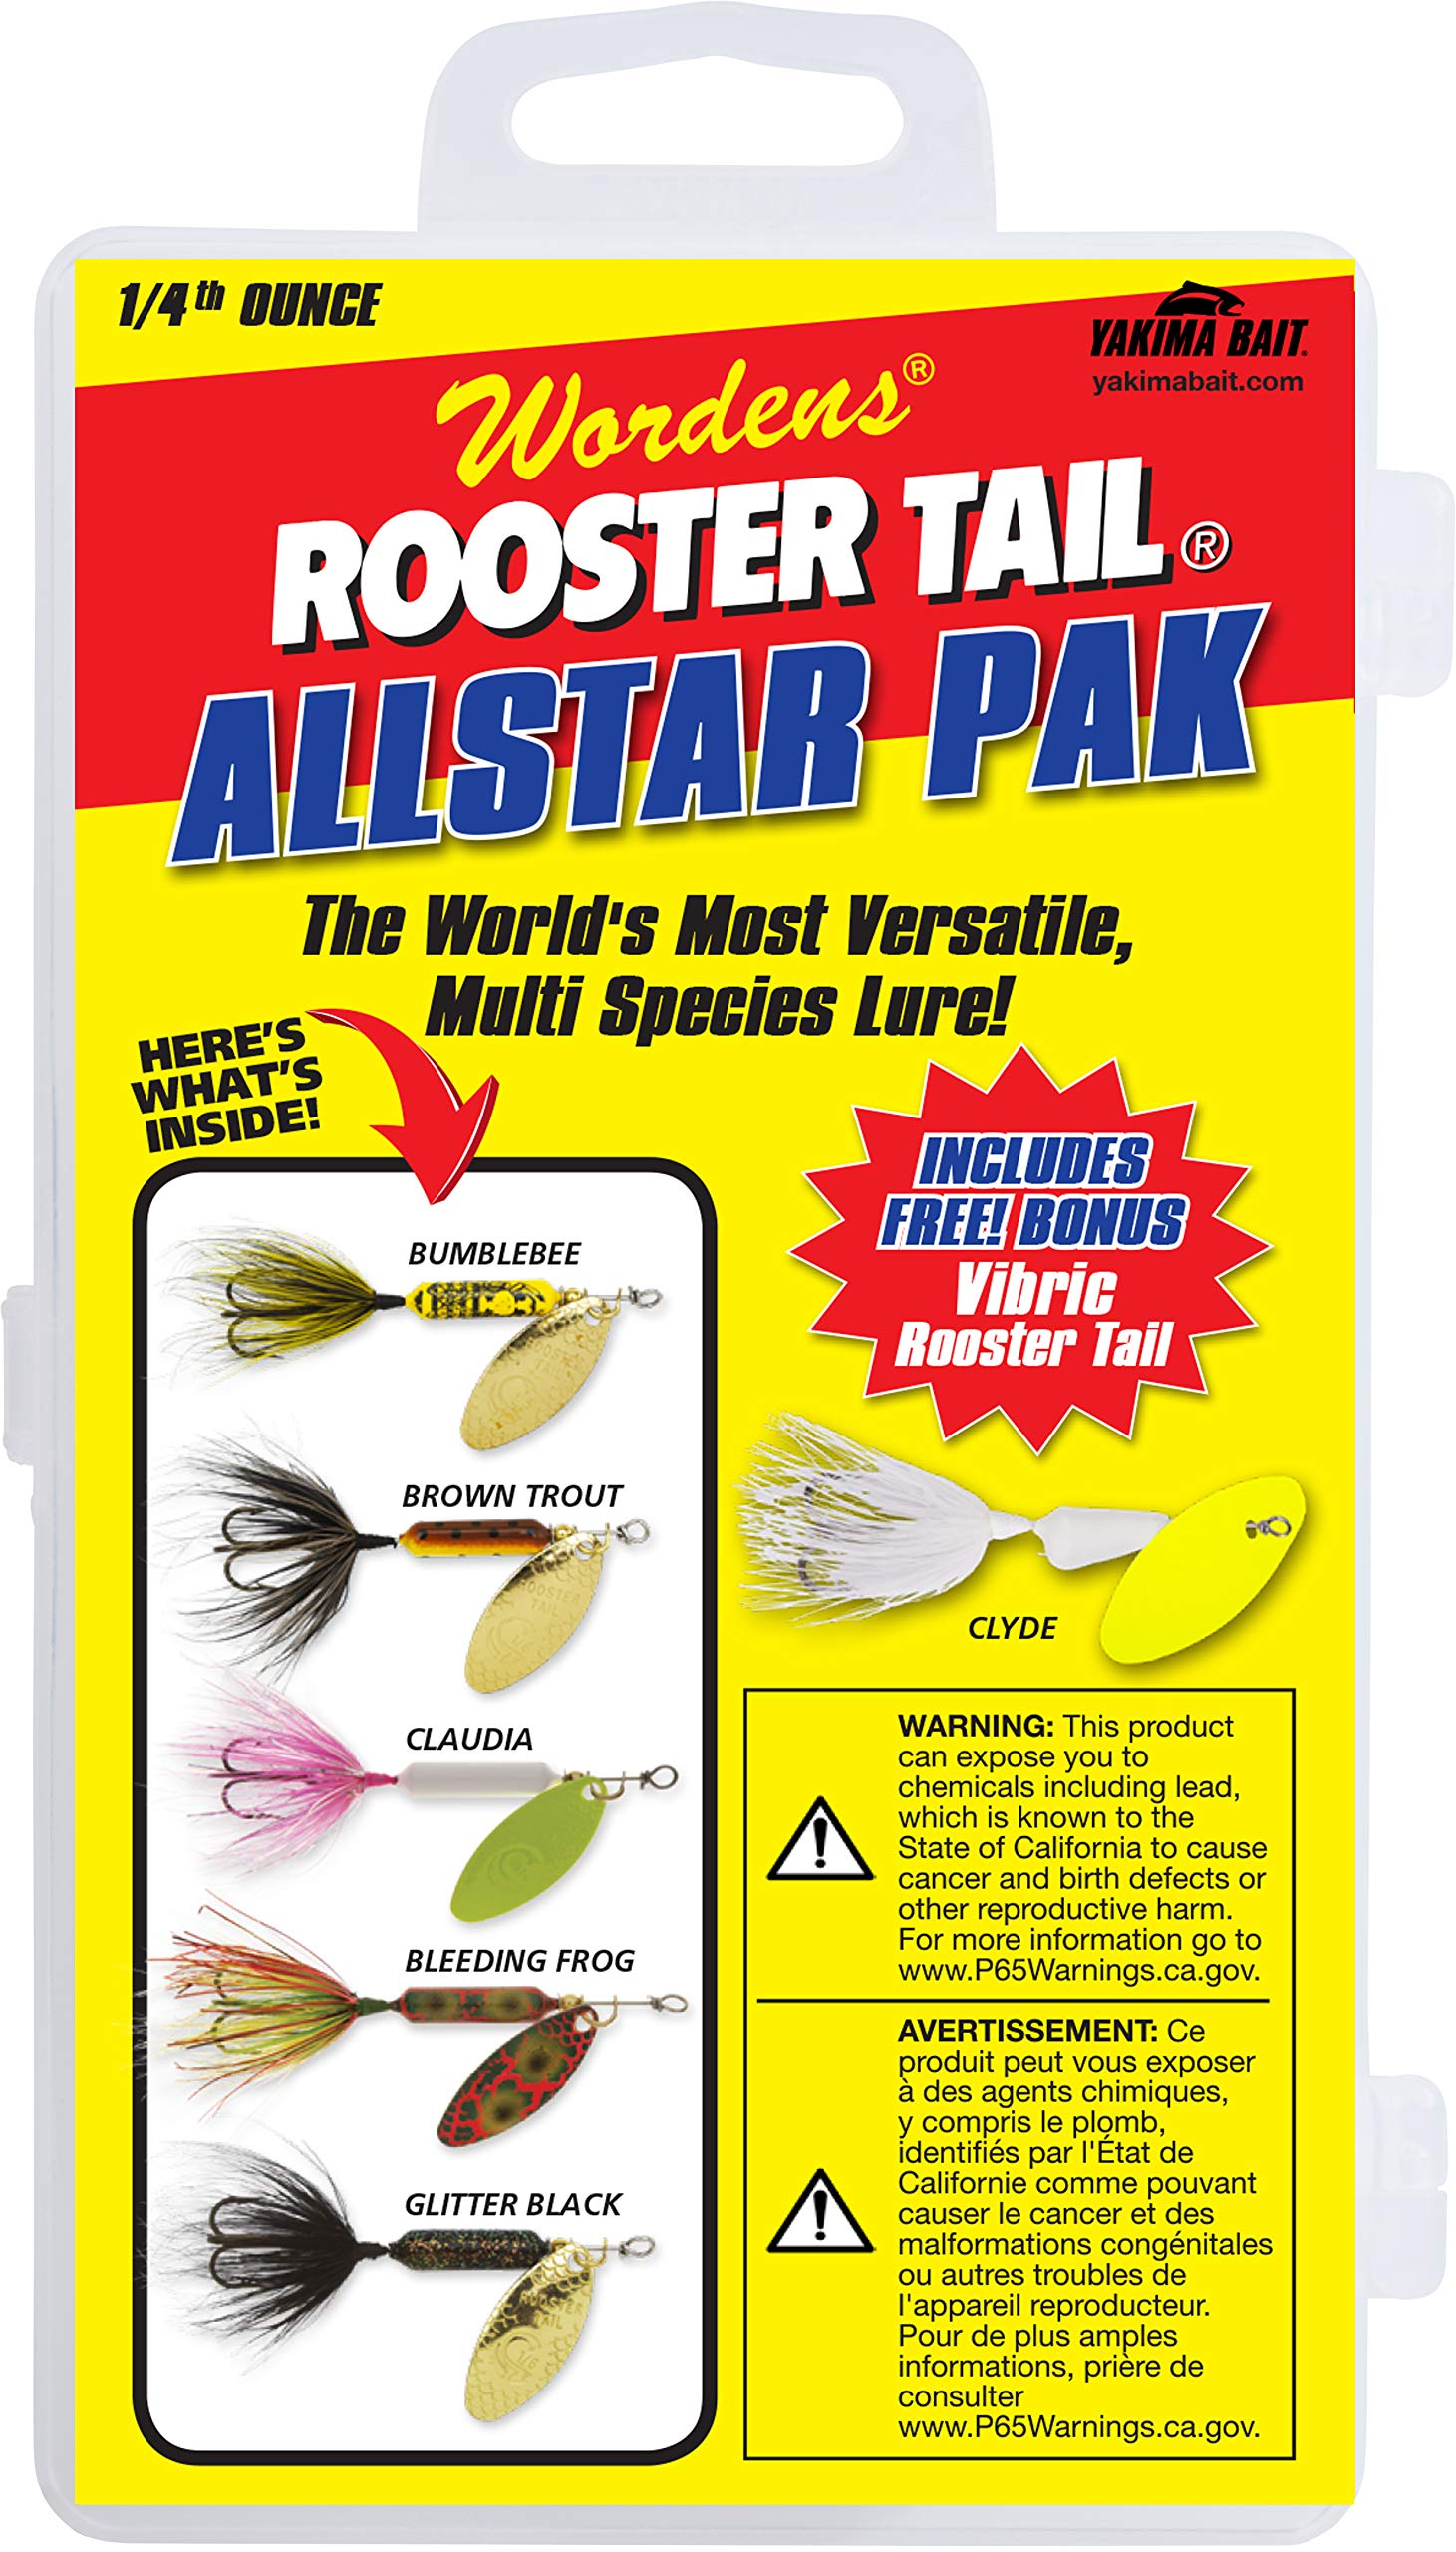 Yakima Bait Rooster Tail 1/4oz Box Kit- Allstar V2 Mix by Yakima Bait